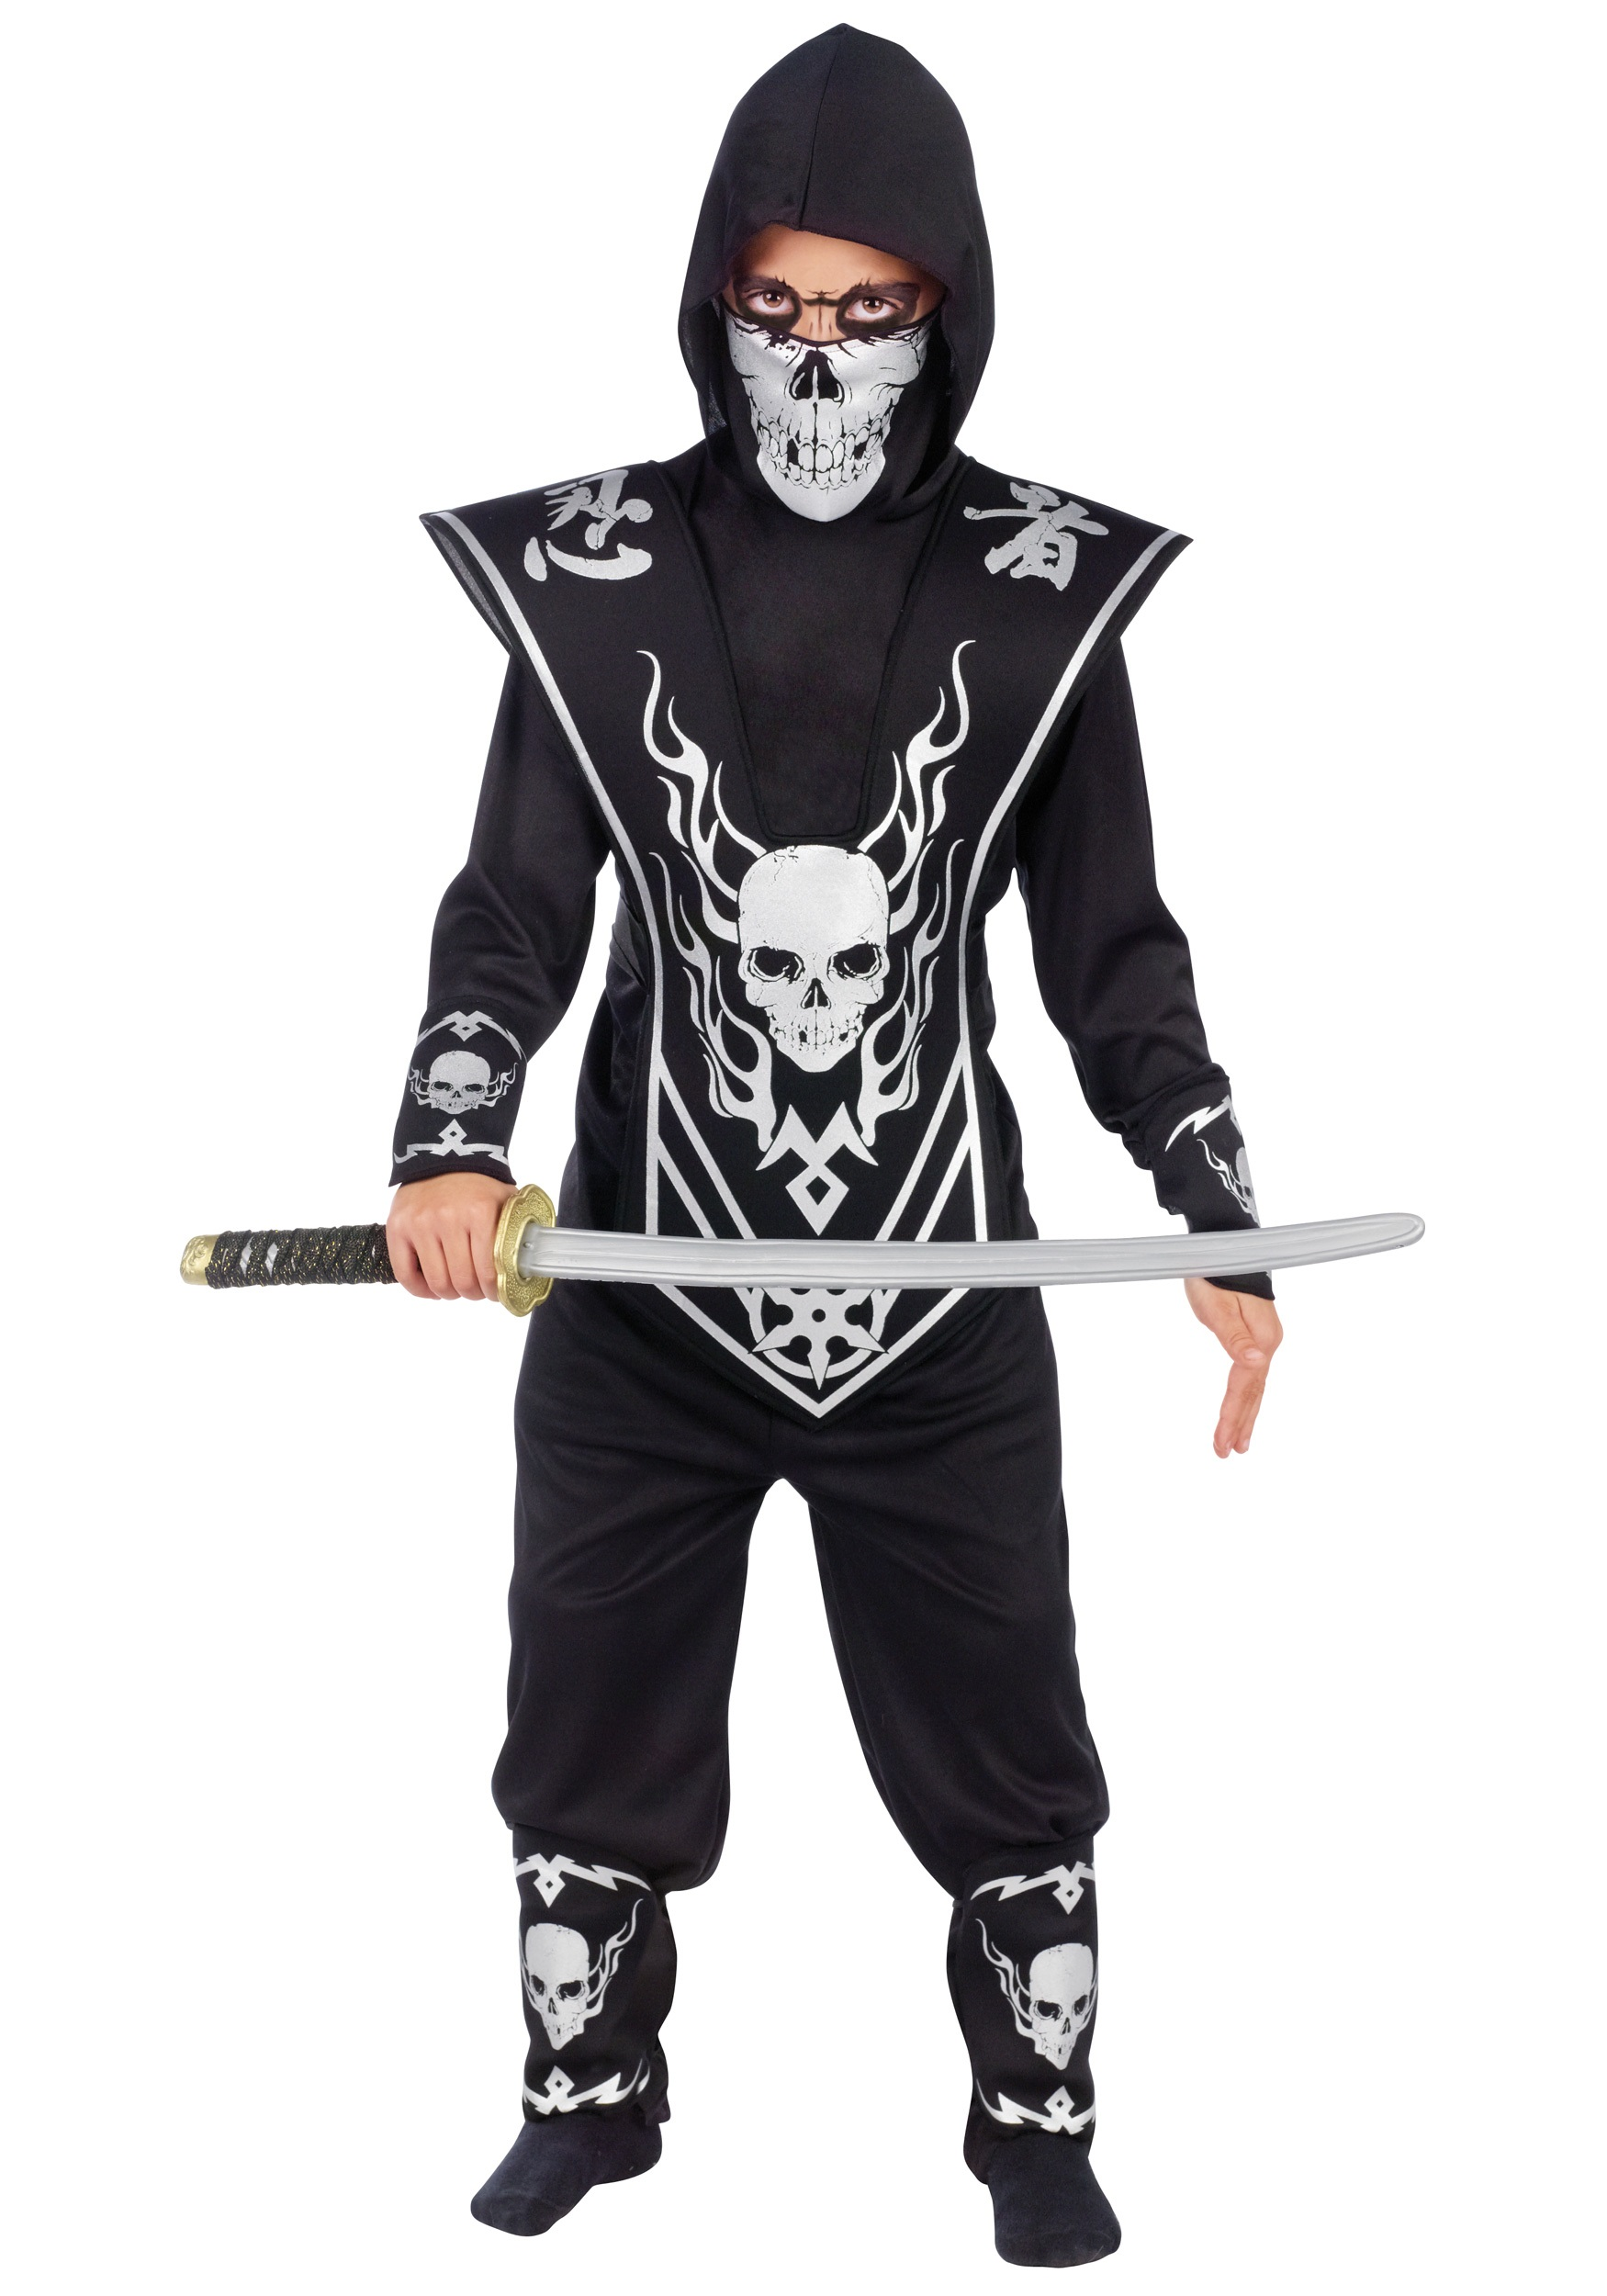 Skull Ninja Boys Costume  sc 1 st  Halloween Costume & Skull Ninja Boys Costume - Kids Scary Halloween Costumes